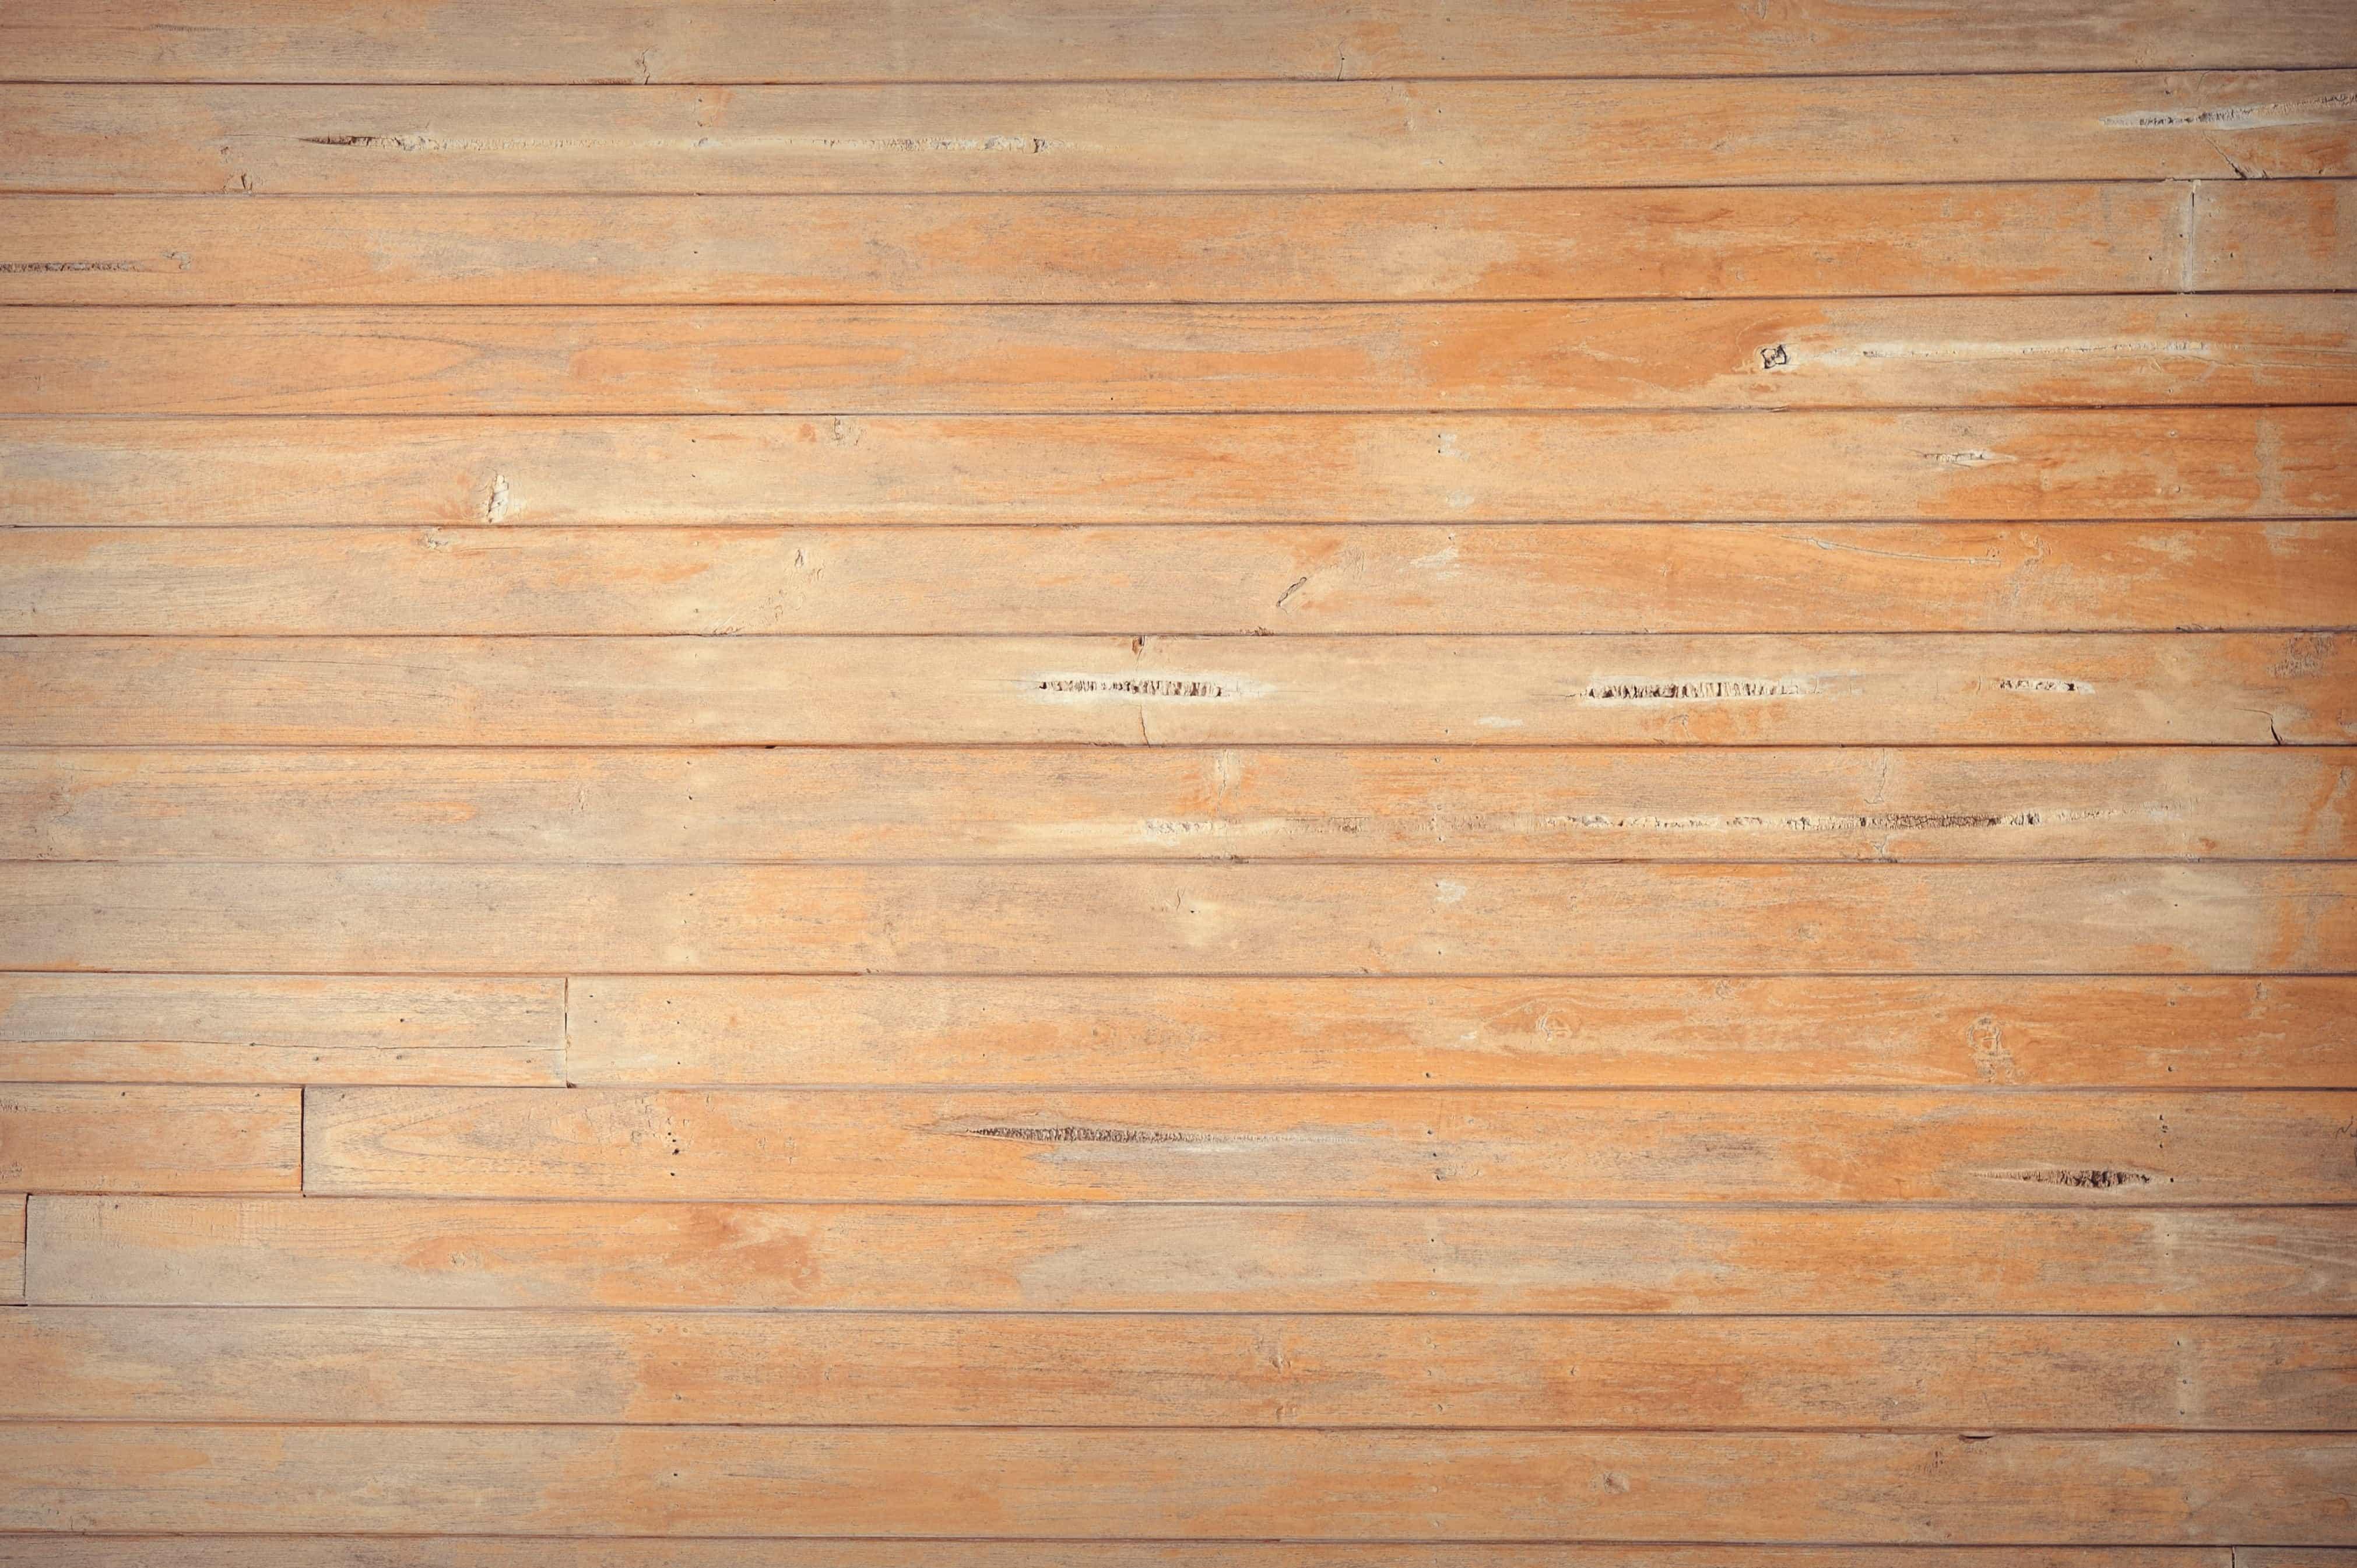 Carpentry Wood Floor Rough Retro Hardwood Surface